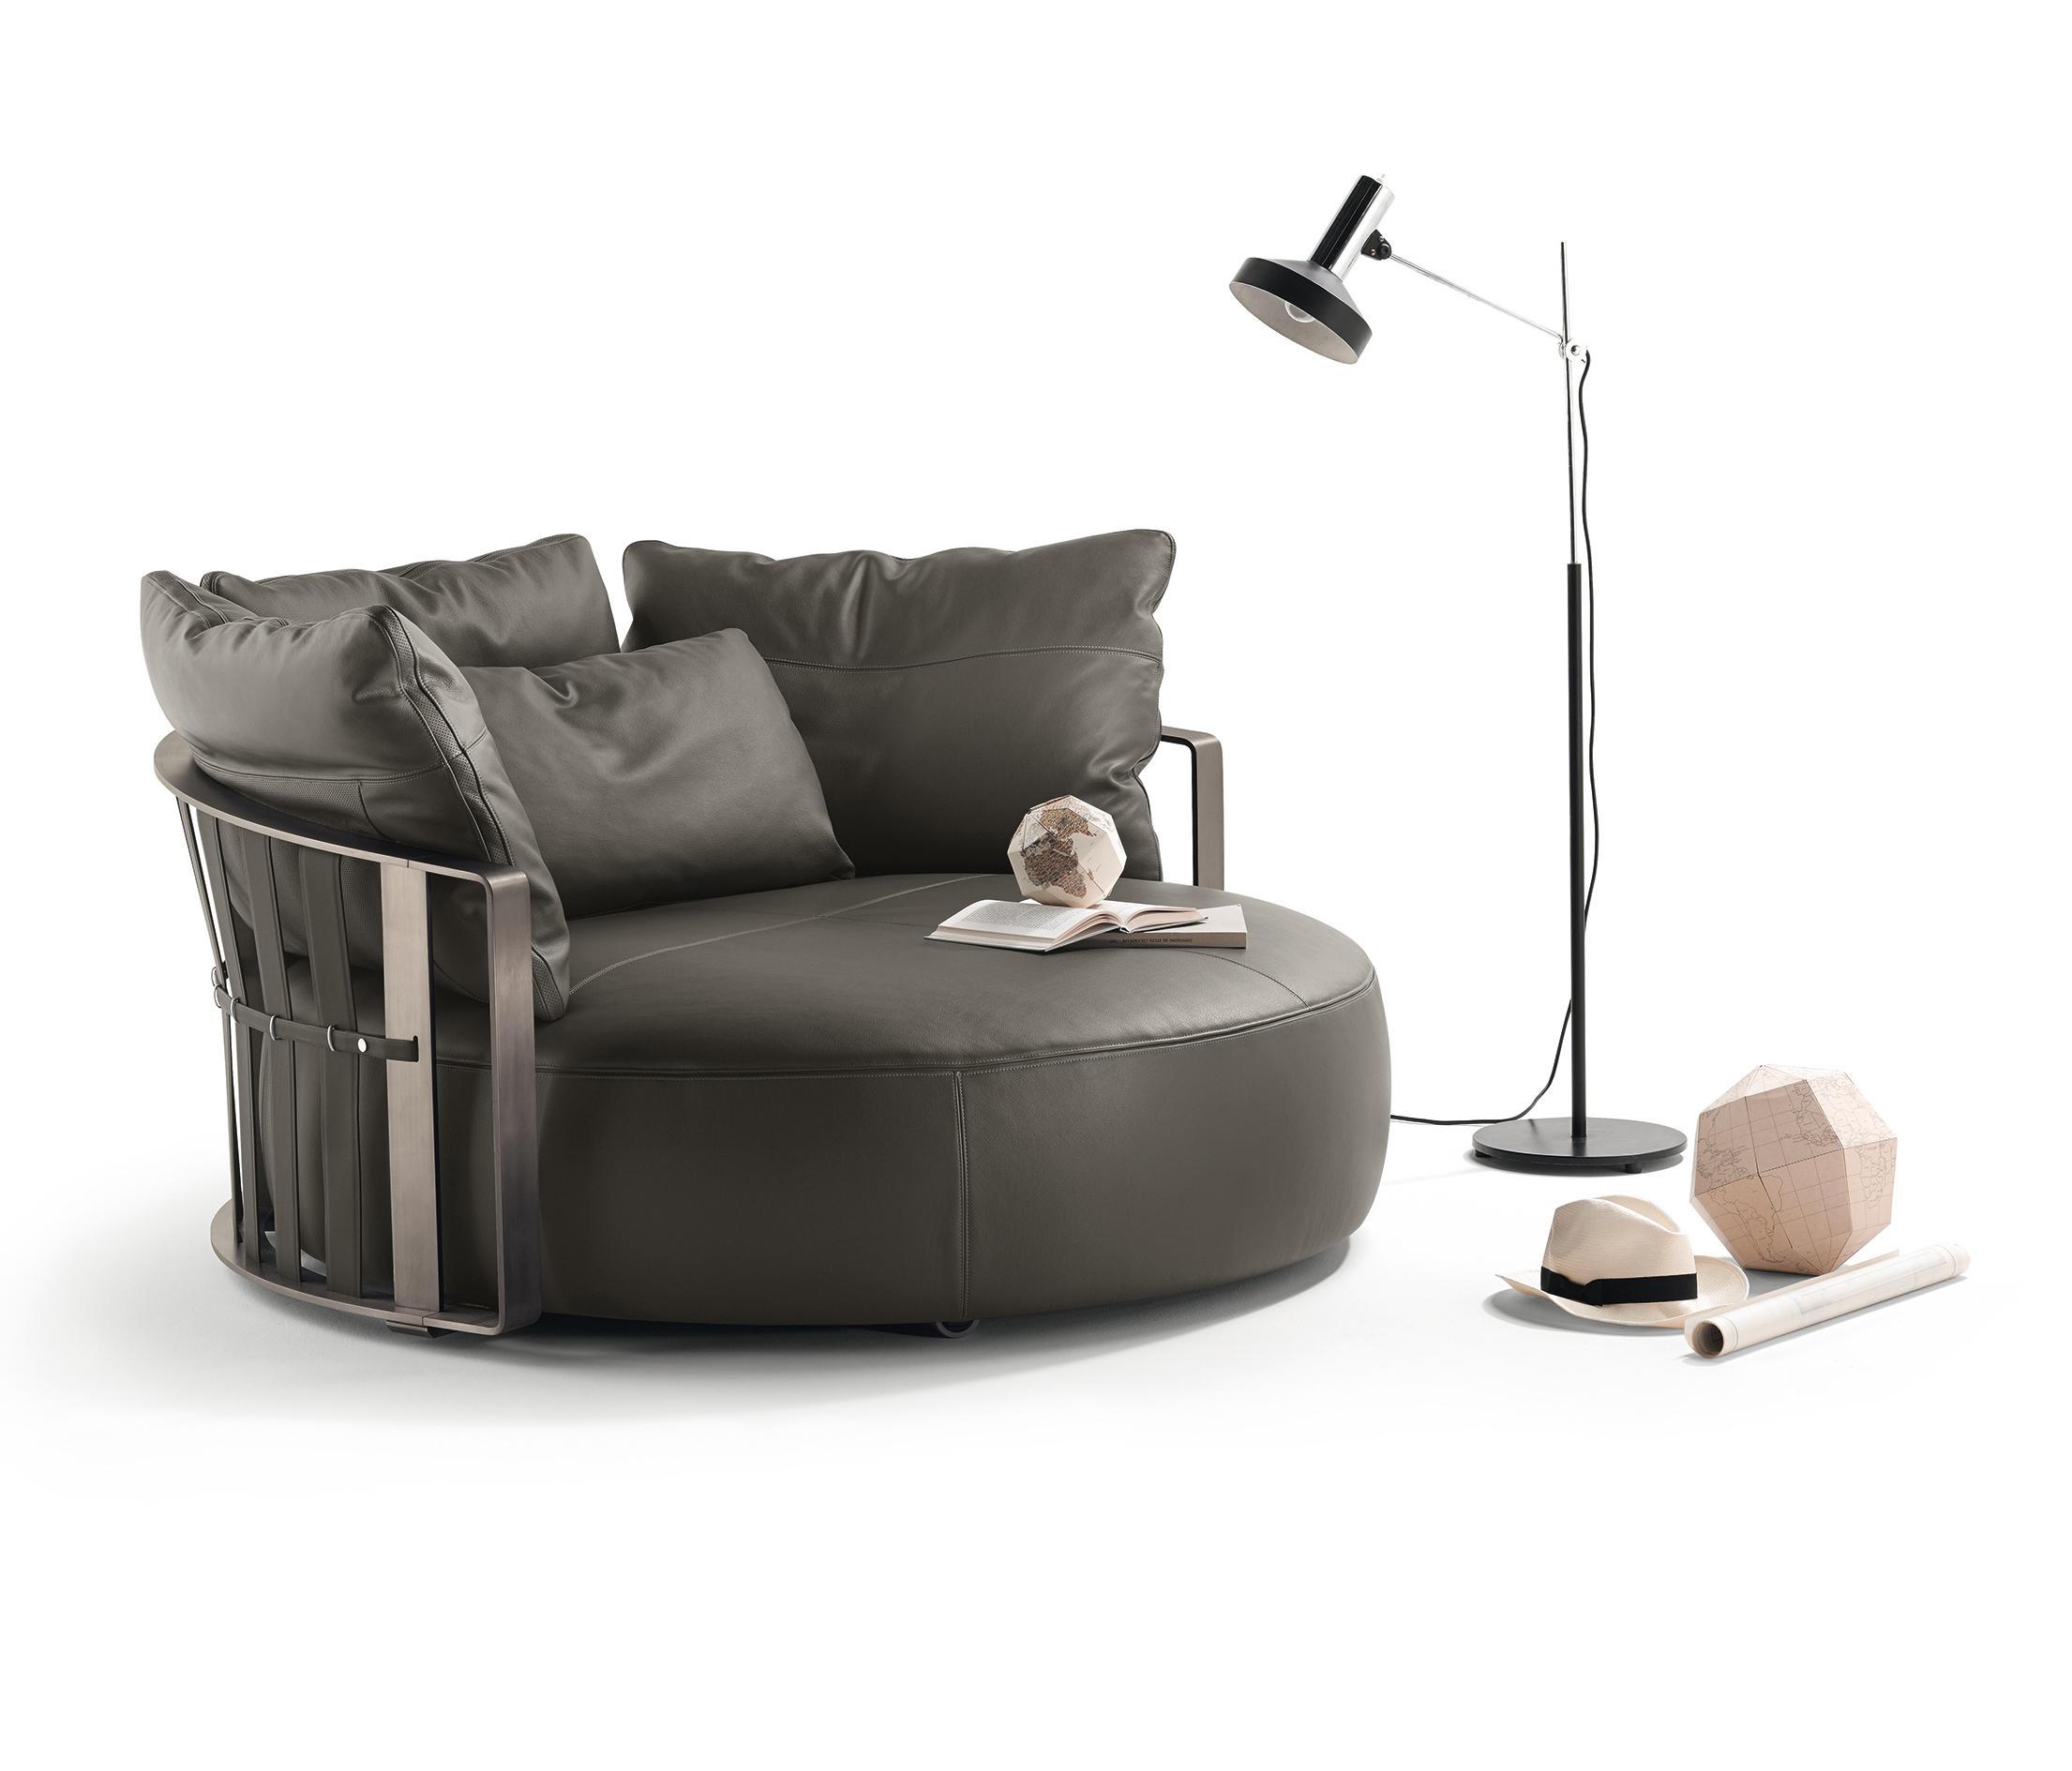 Sofa Redondo Free Elegant Sofa Moroso Redondo Sofa Furniture  # Muebles Memphis